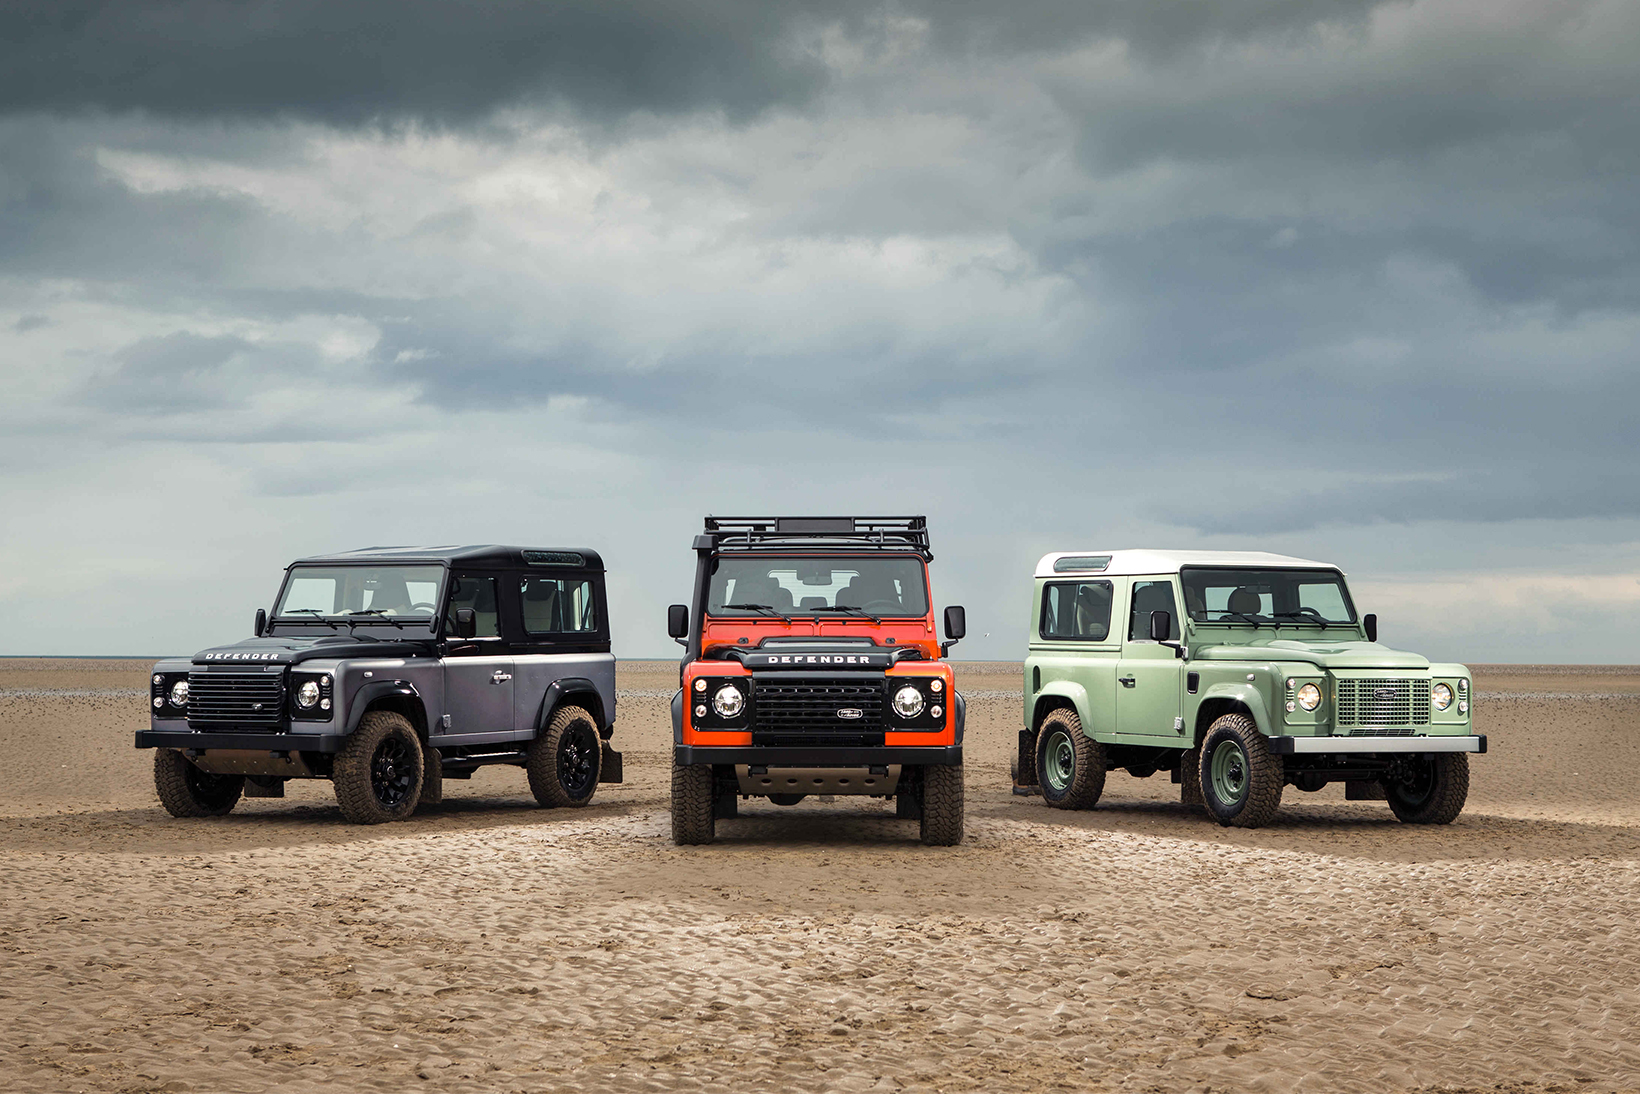 Billionaire Jim Ratcliffe Wants to Help Land Rover Revive the Defender